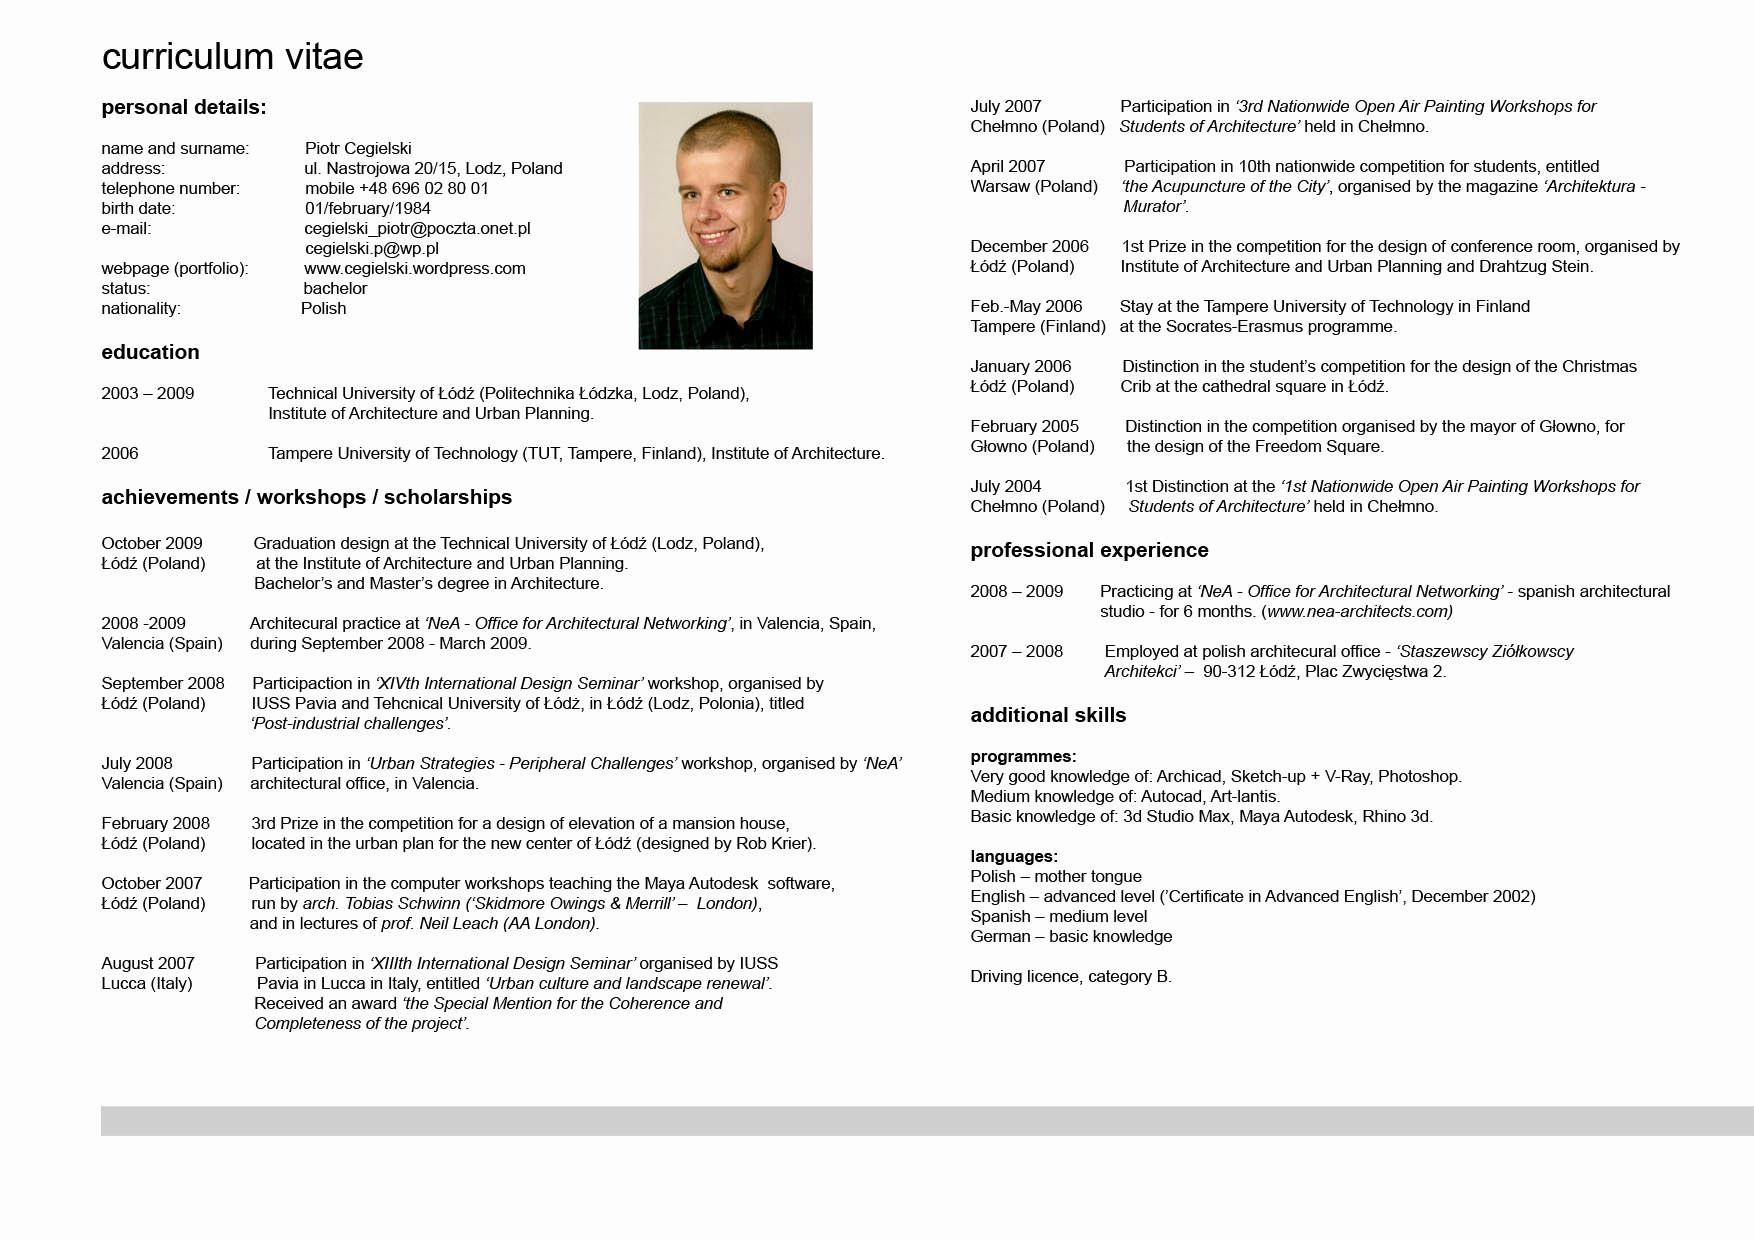 Sample Of Curriculum Vitae format Inspirational Curriculum Vitae Resume Cv